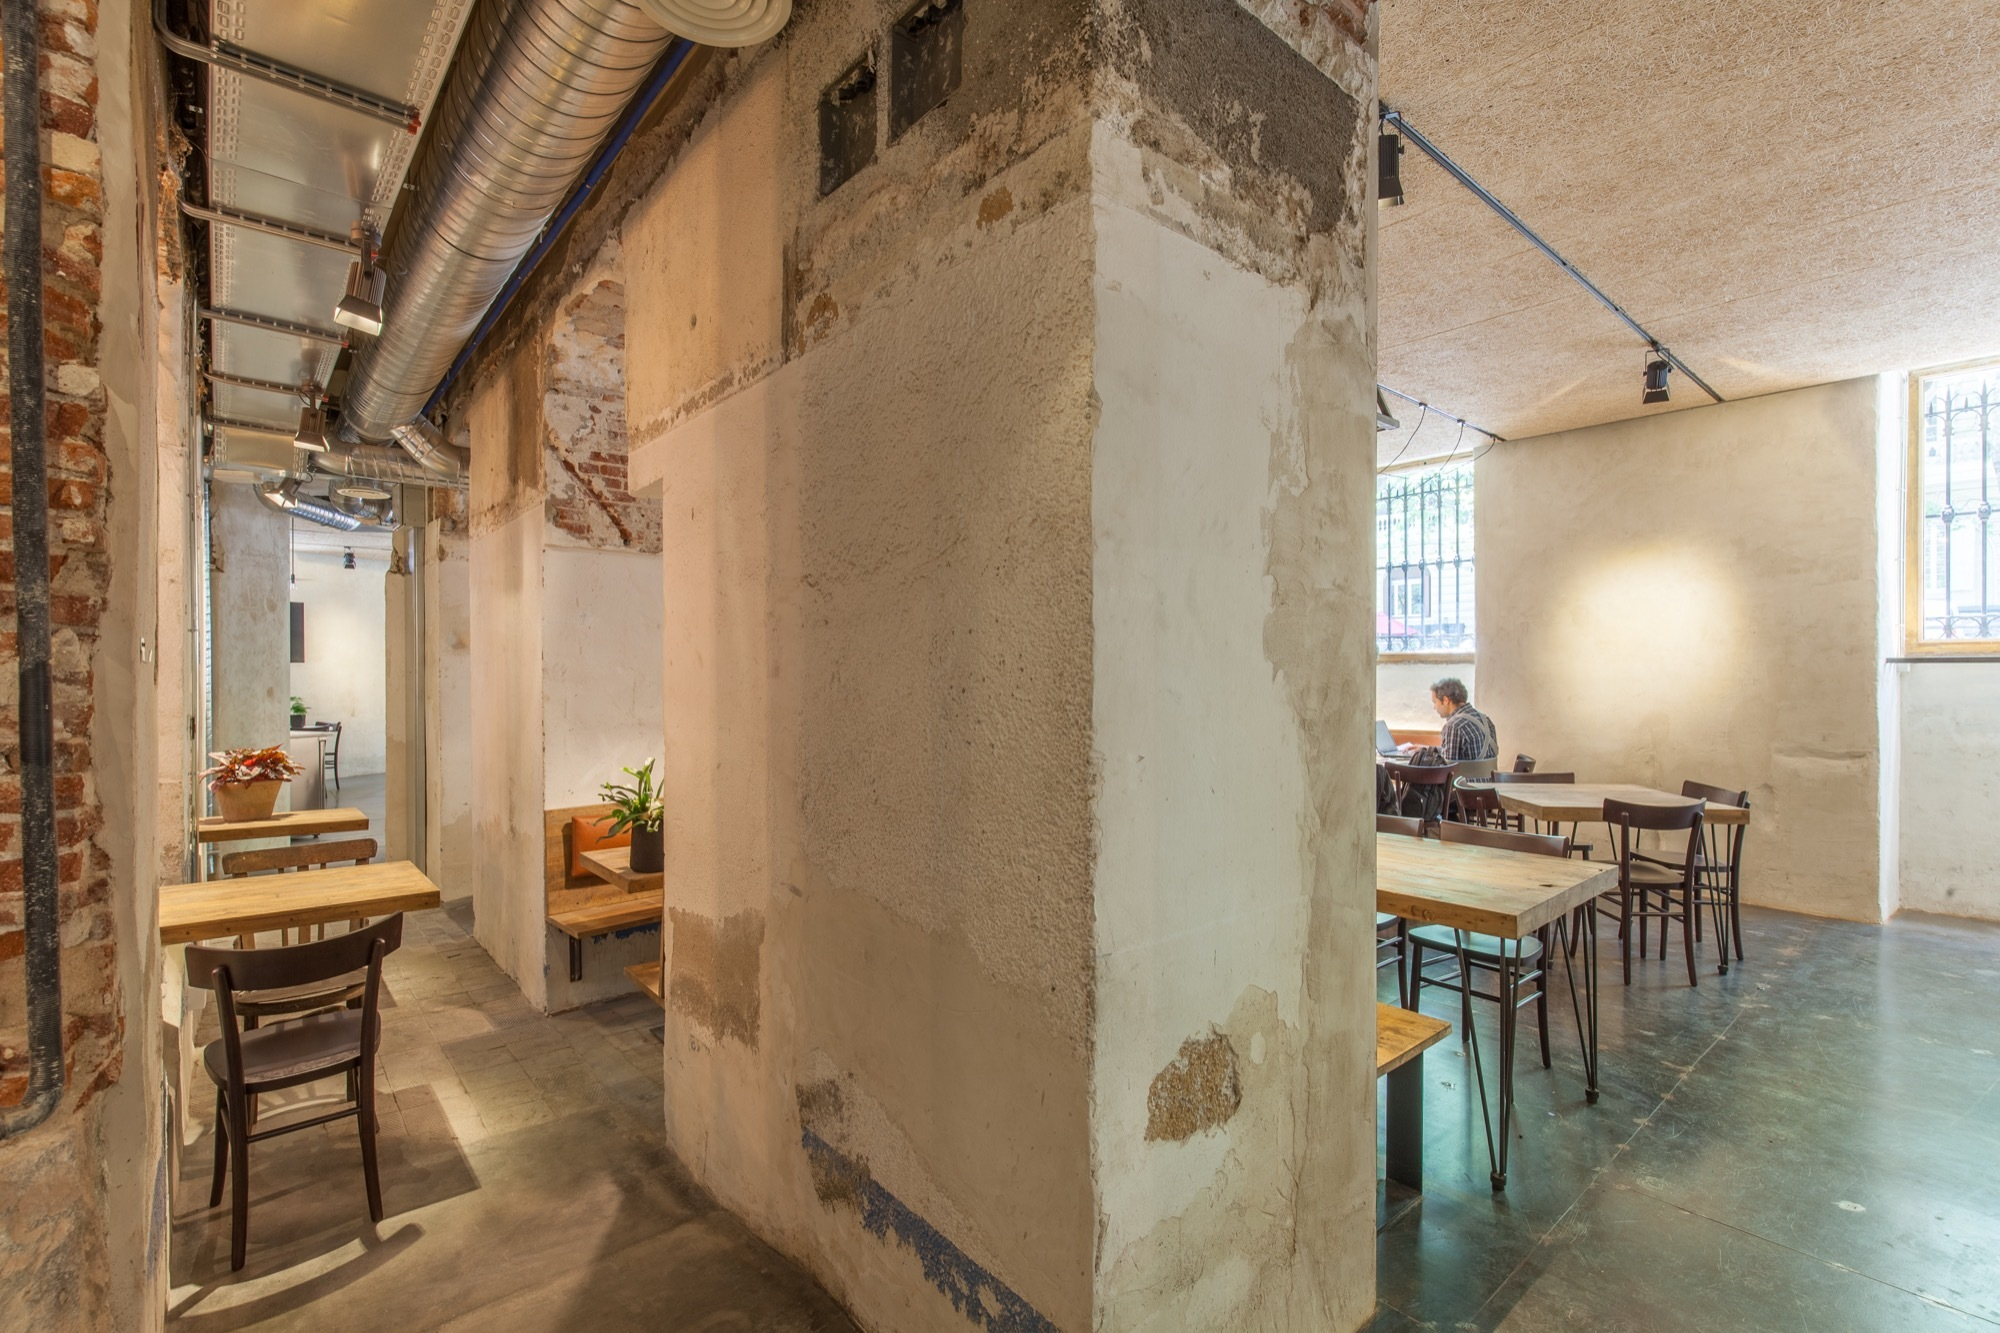 Galer a de fismuler arquitectura invisible 17 - Arquitectura invisible ...